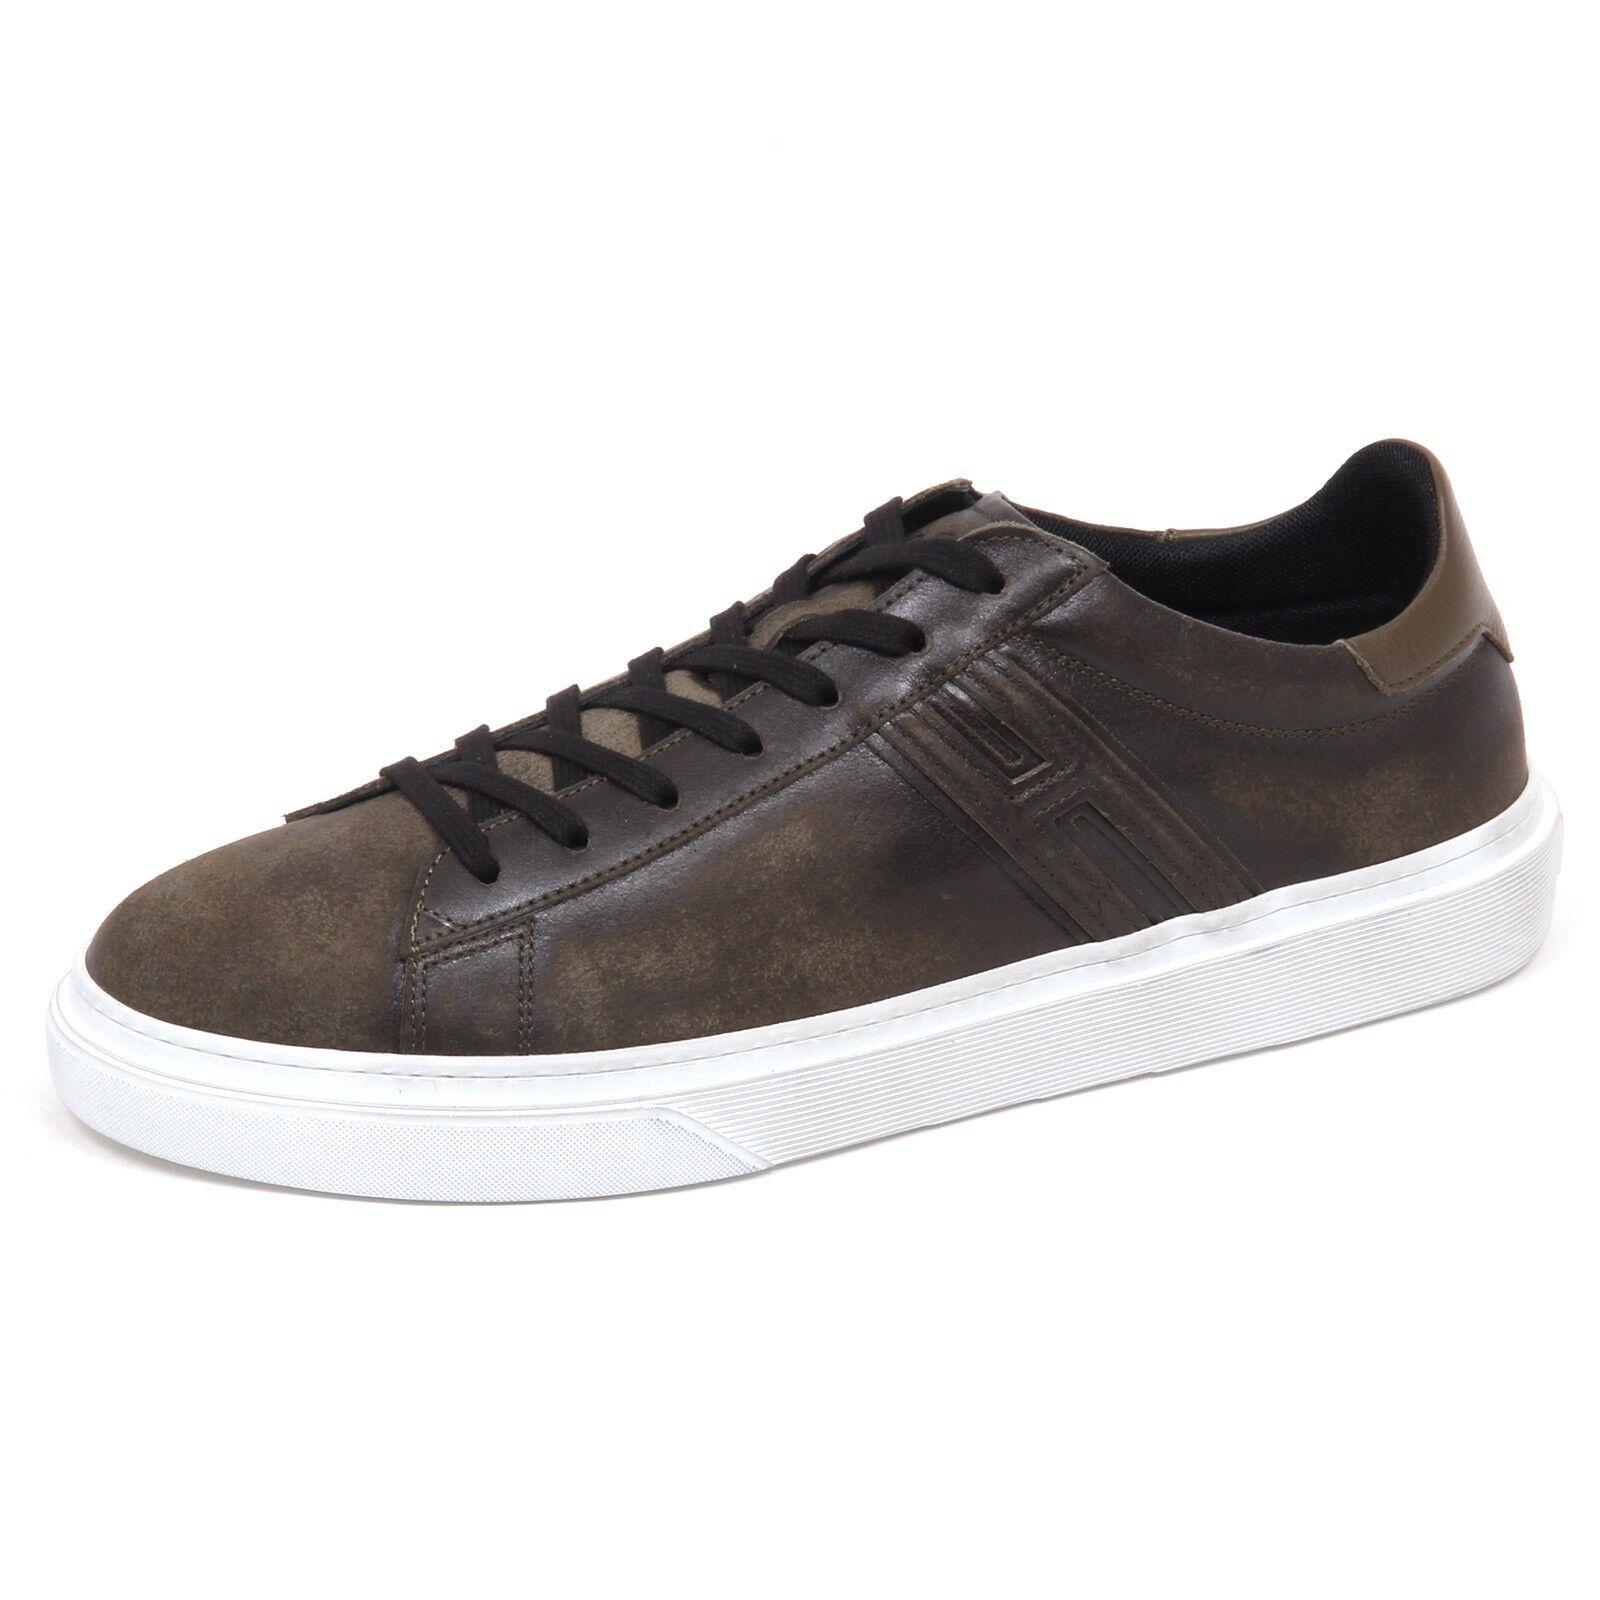 E0606 sneaker uomo green HOGAN H340 shoe man